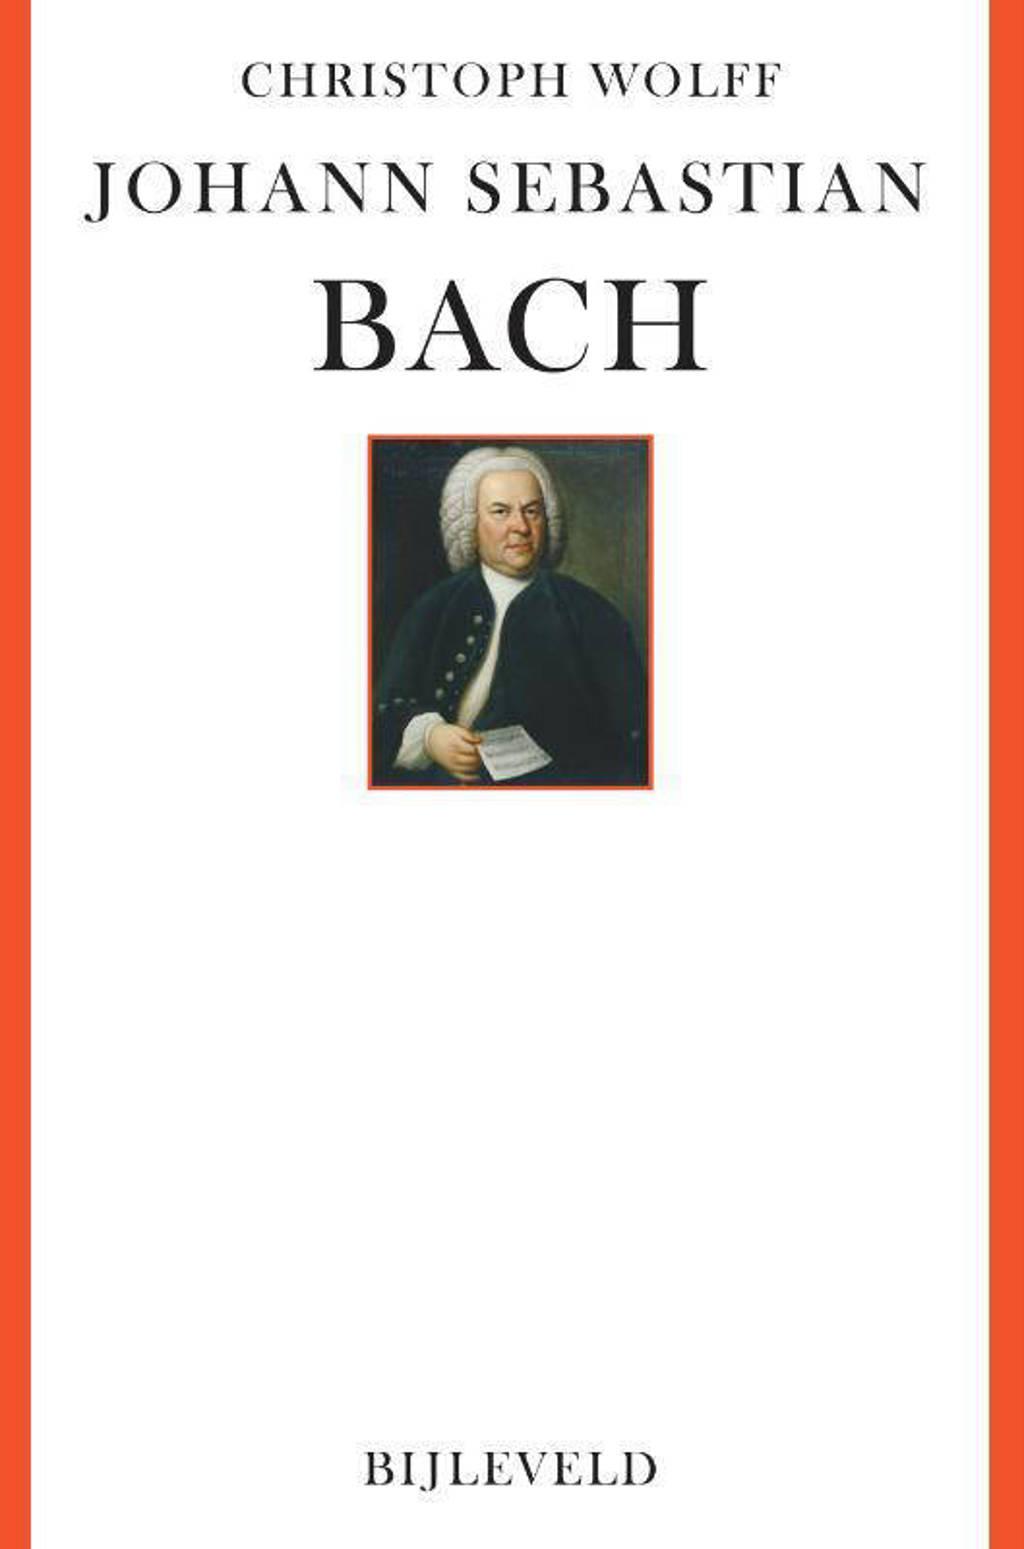 Johann Sebastian Bach - Christoph Wolff